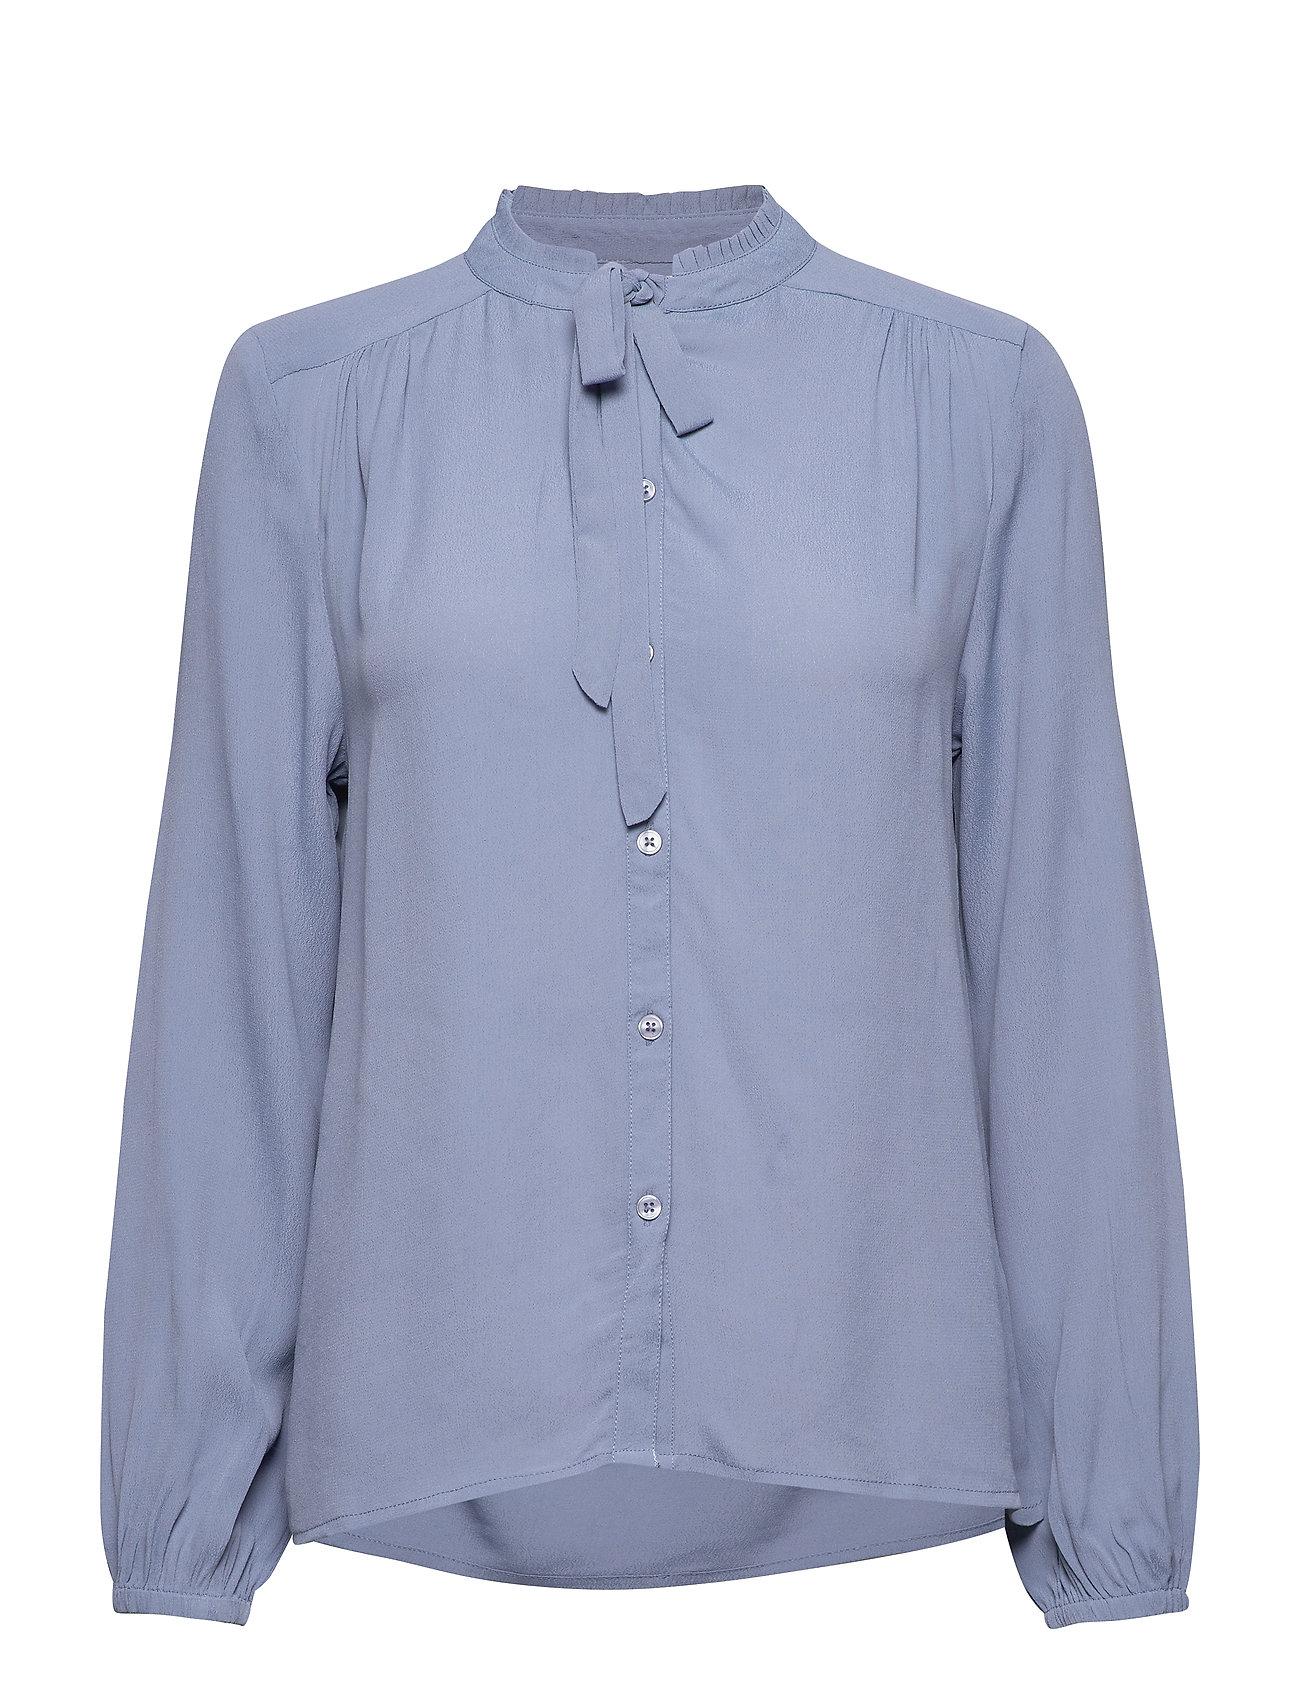 Cream Ava Shirt - INFINITY BLUE